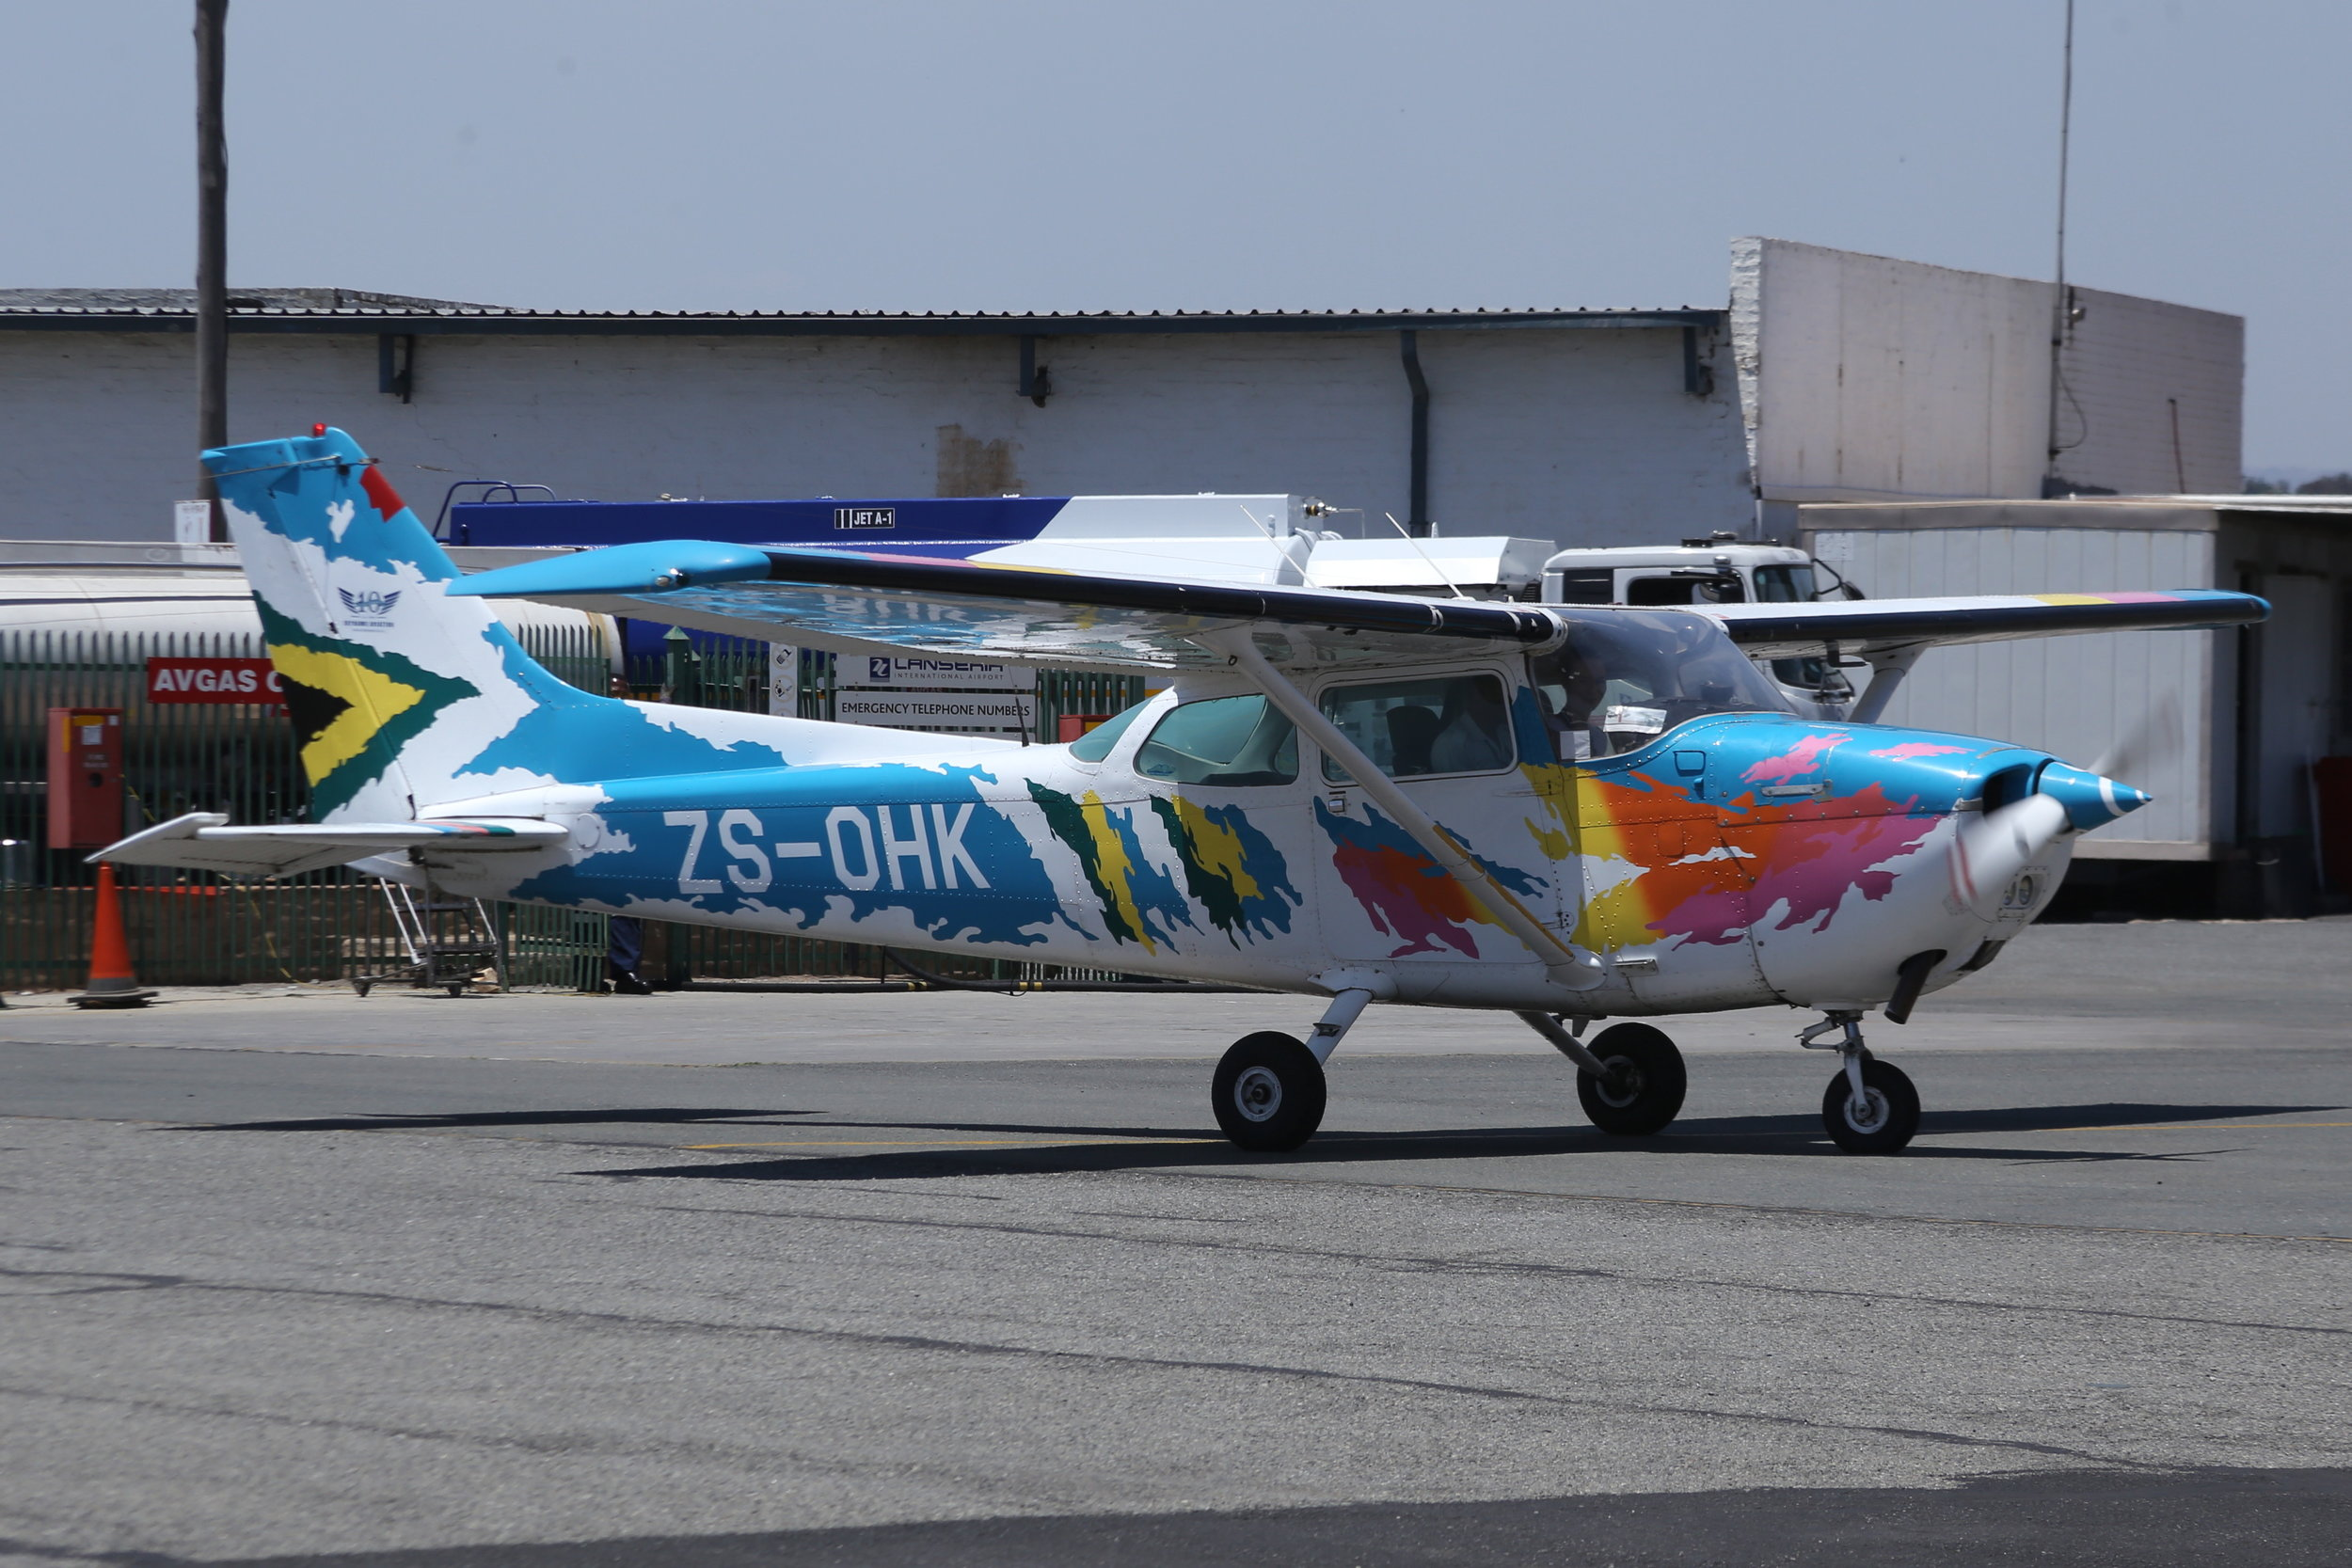 ZS-OHK Cessna 172 taken at Lanseria 9th November 2018 by John Wood